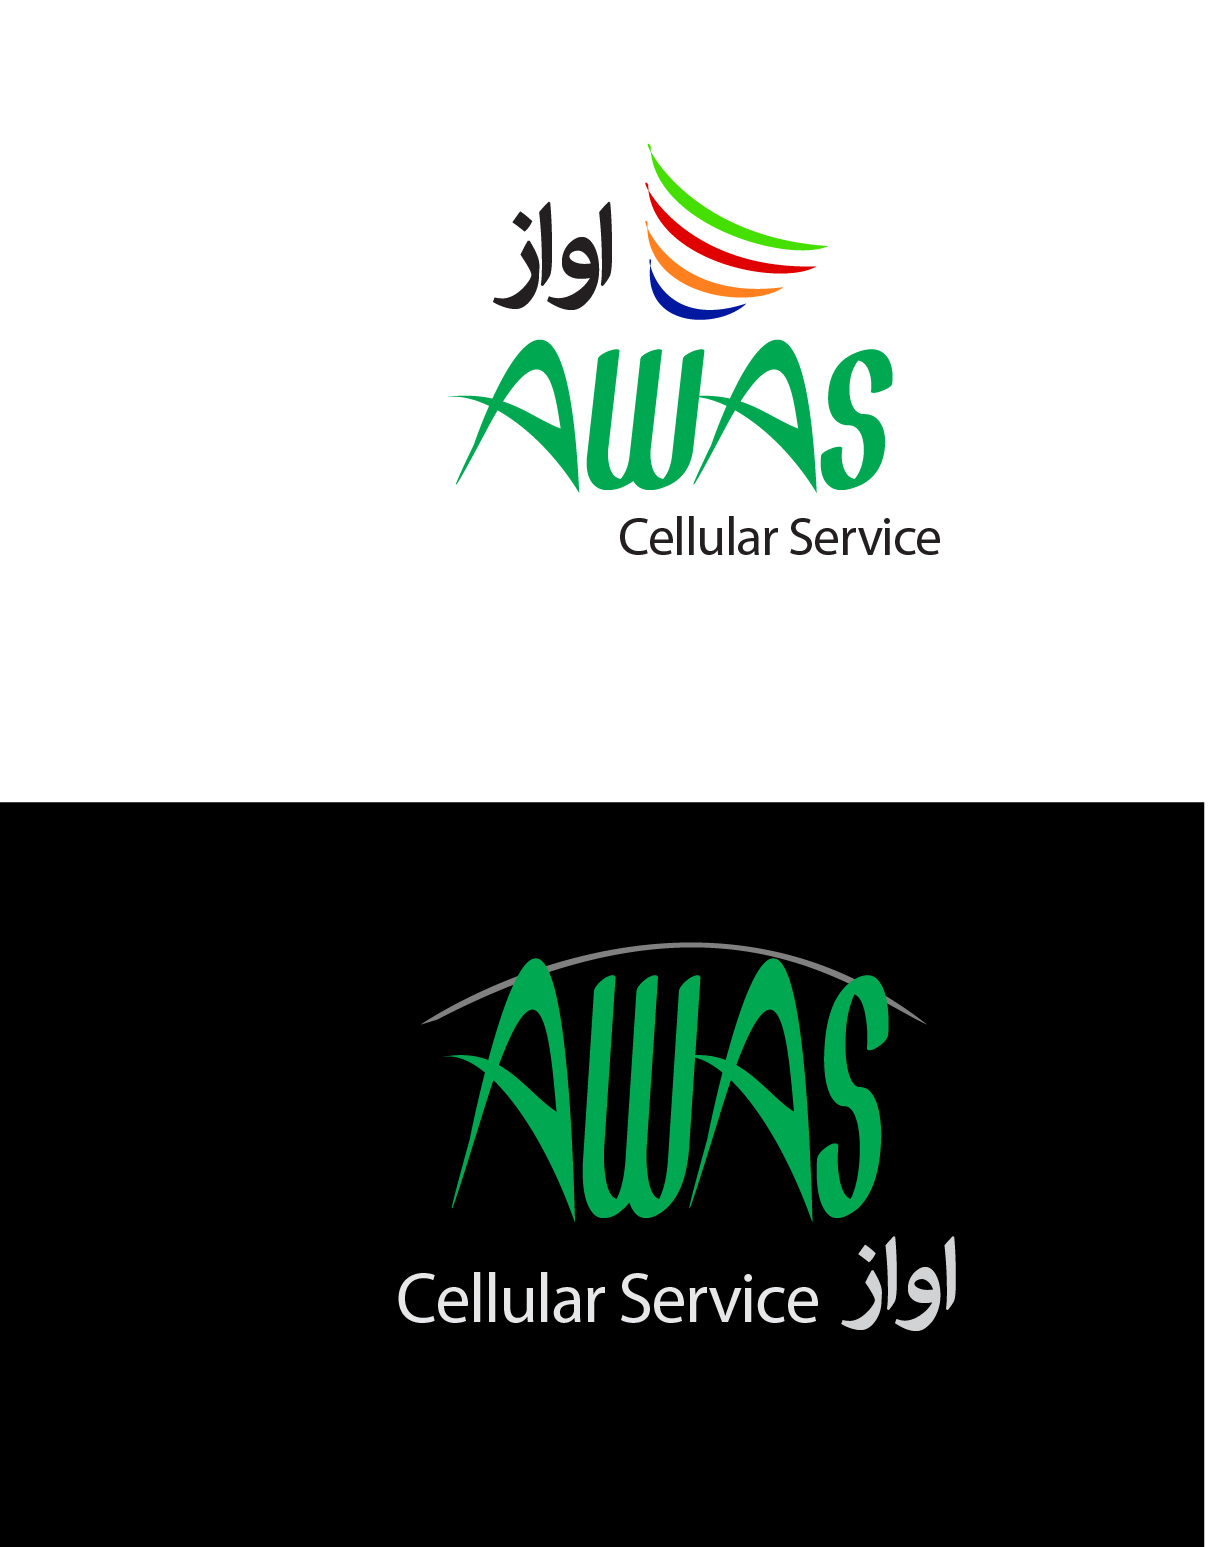 Logo Design by Nancy Grant - Entry No. 61 in the Logo Design Contest AWAS Logo Design.